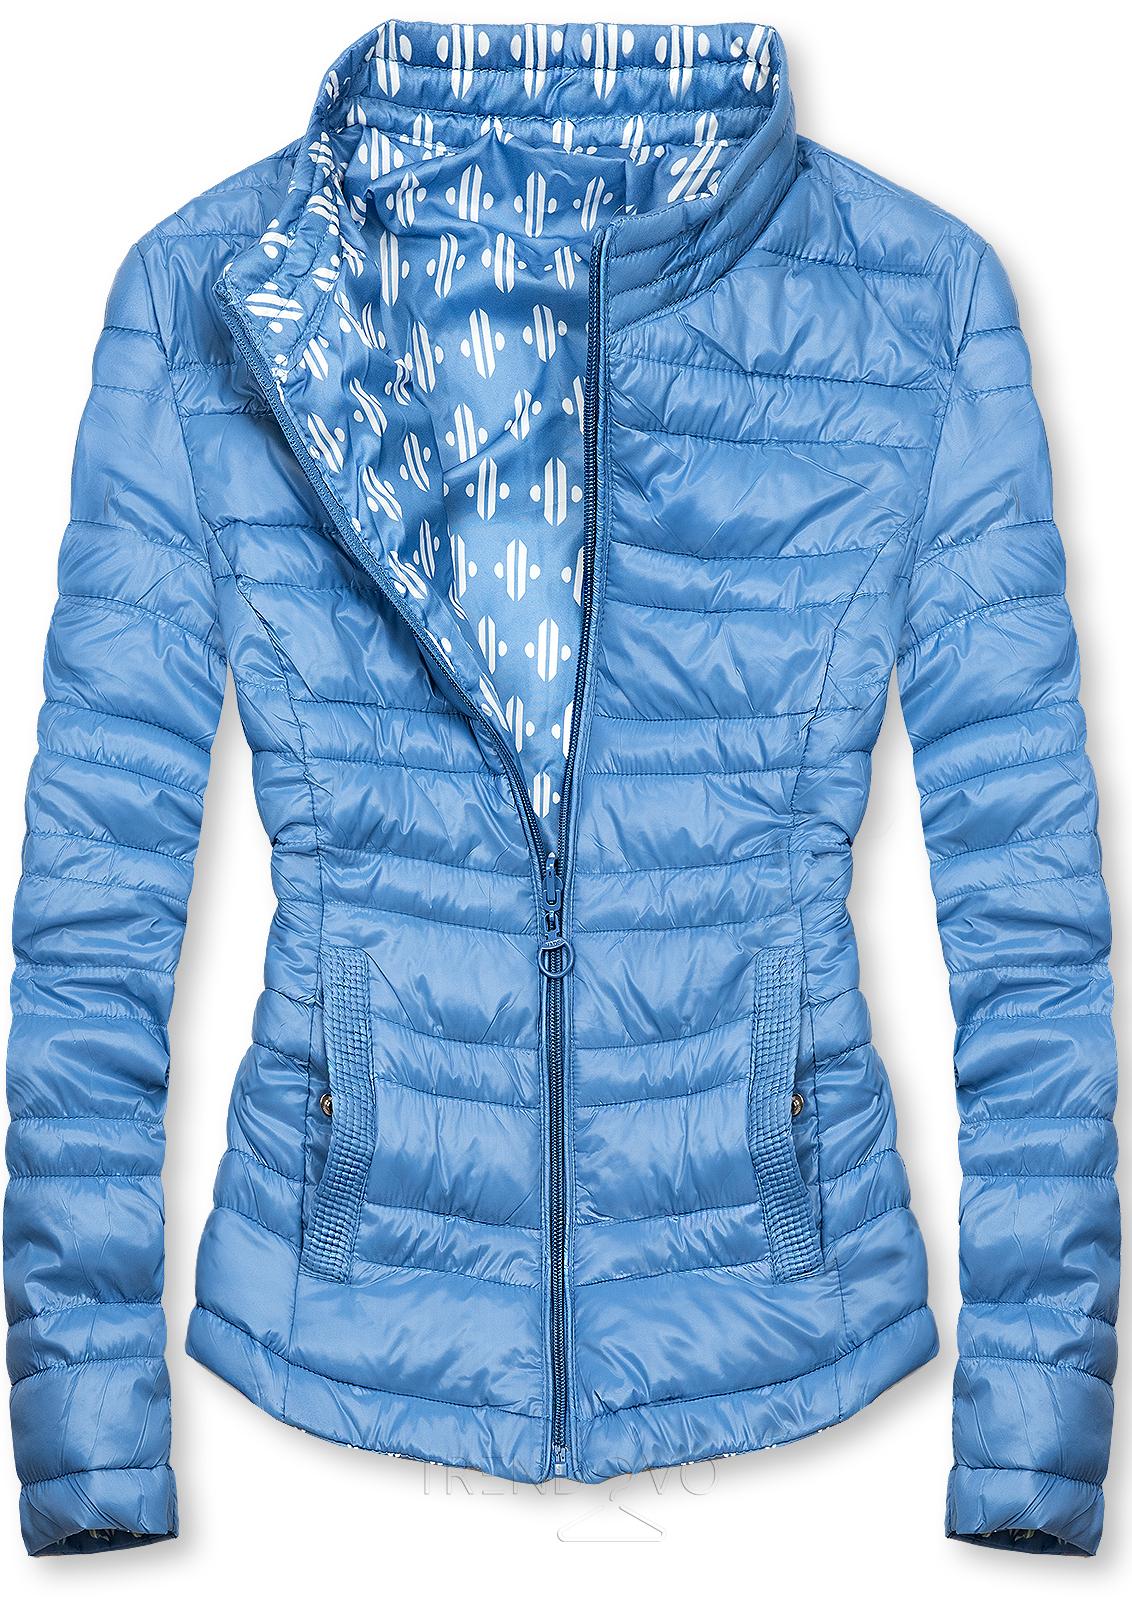 Modrá krátká oboustranná bunda